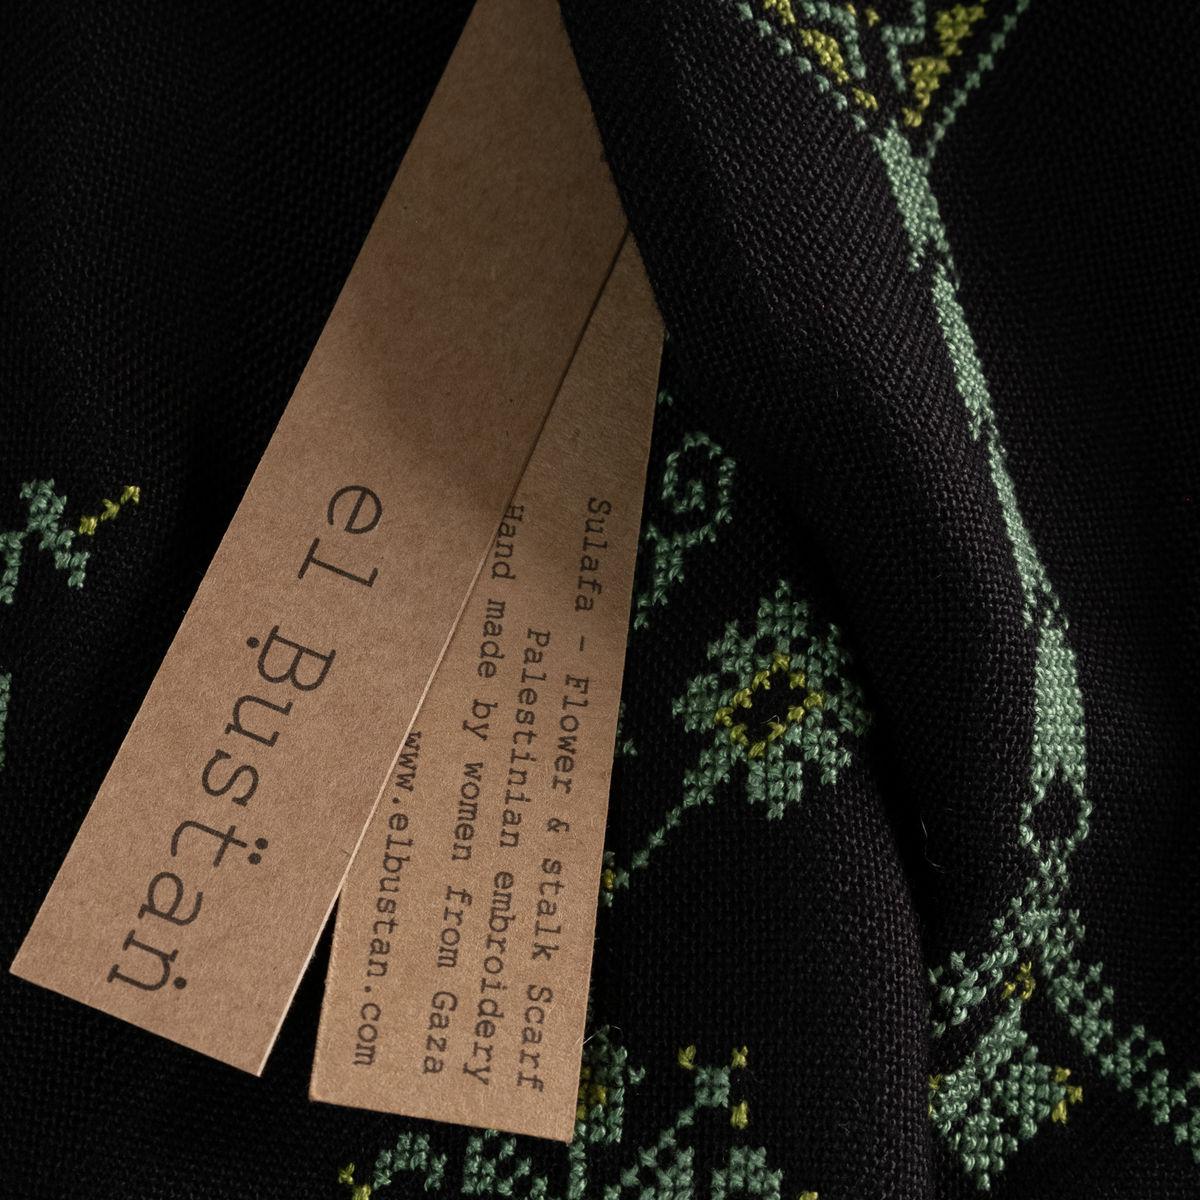 Hand embroidered Palestinian scarf Tatreez - Flower and Stalk - وردة وعرق - Torquiese on Black - Made in Gaza - Sulafa - el Bustan